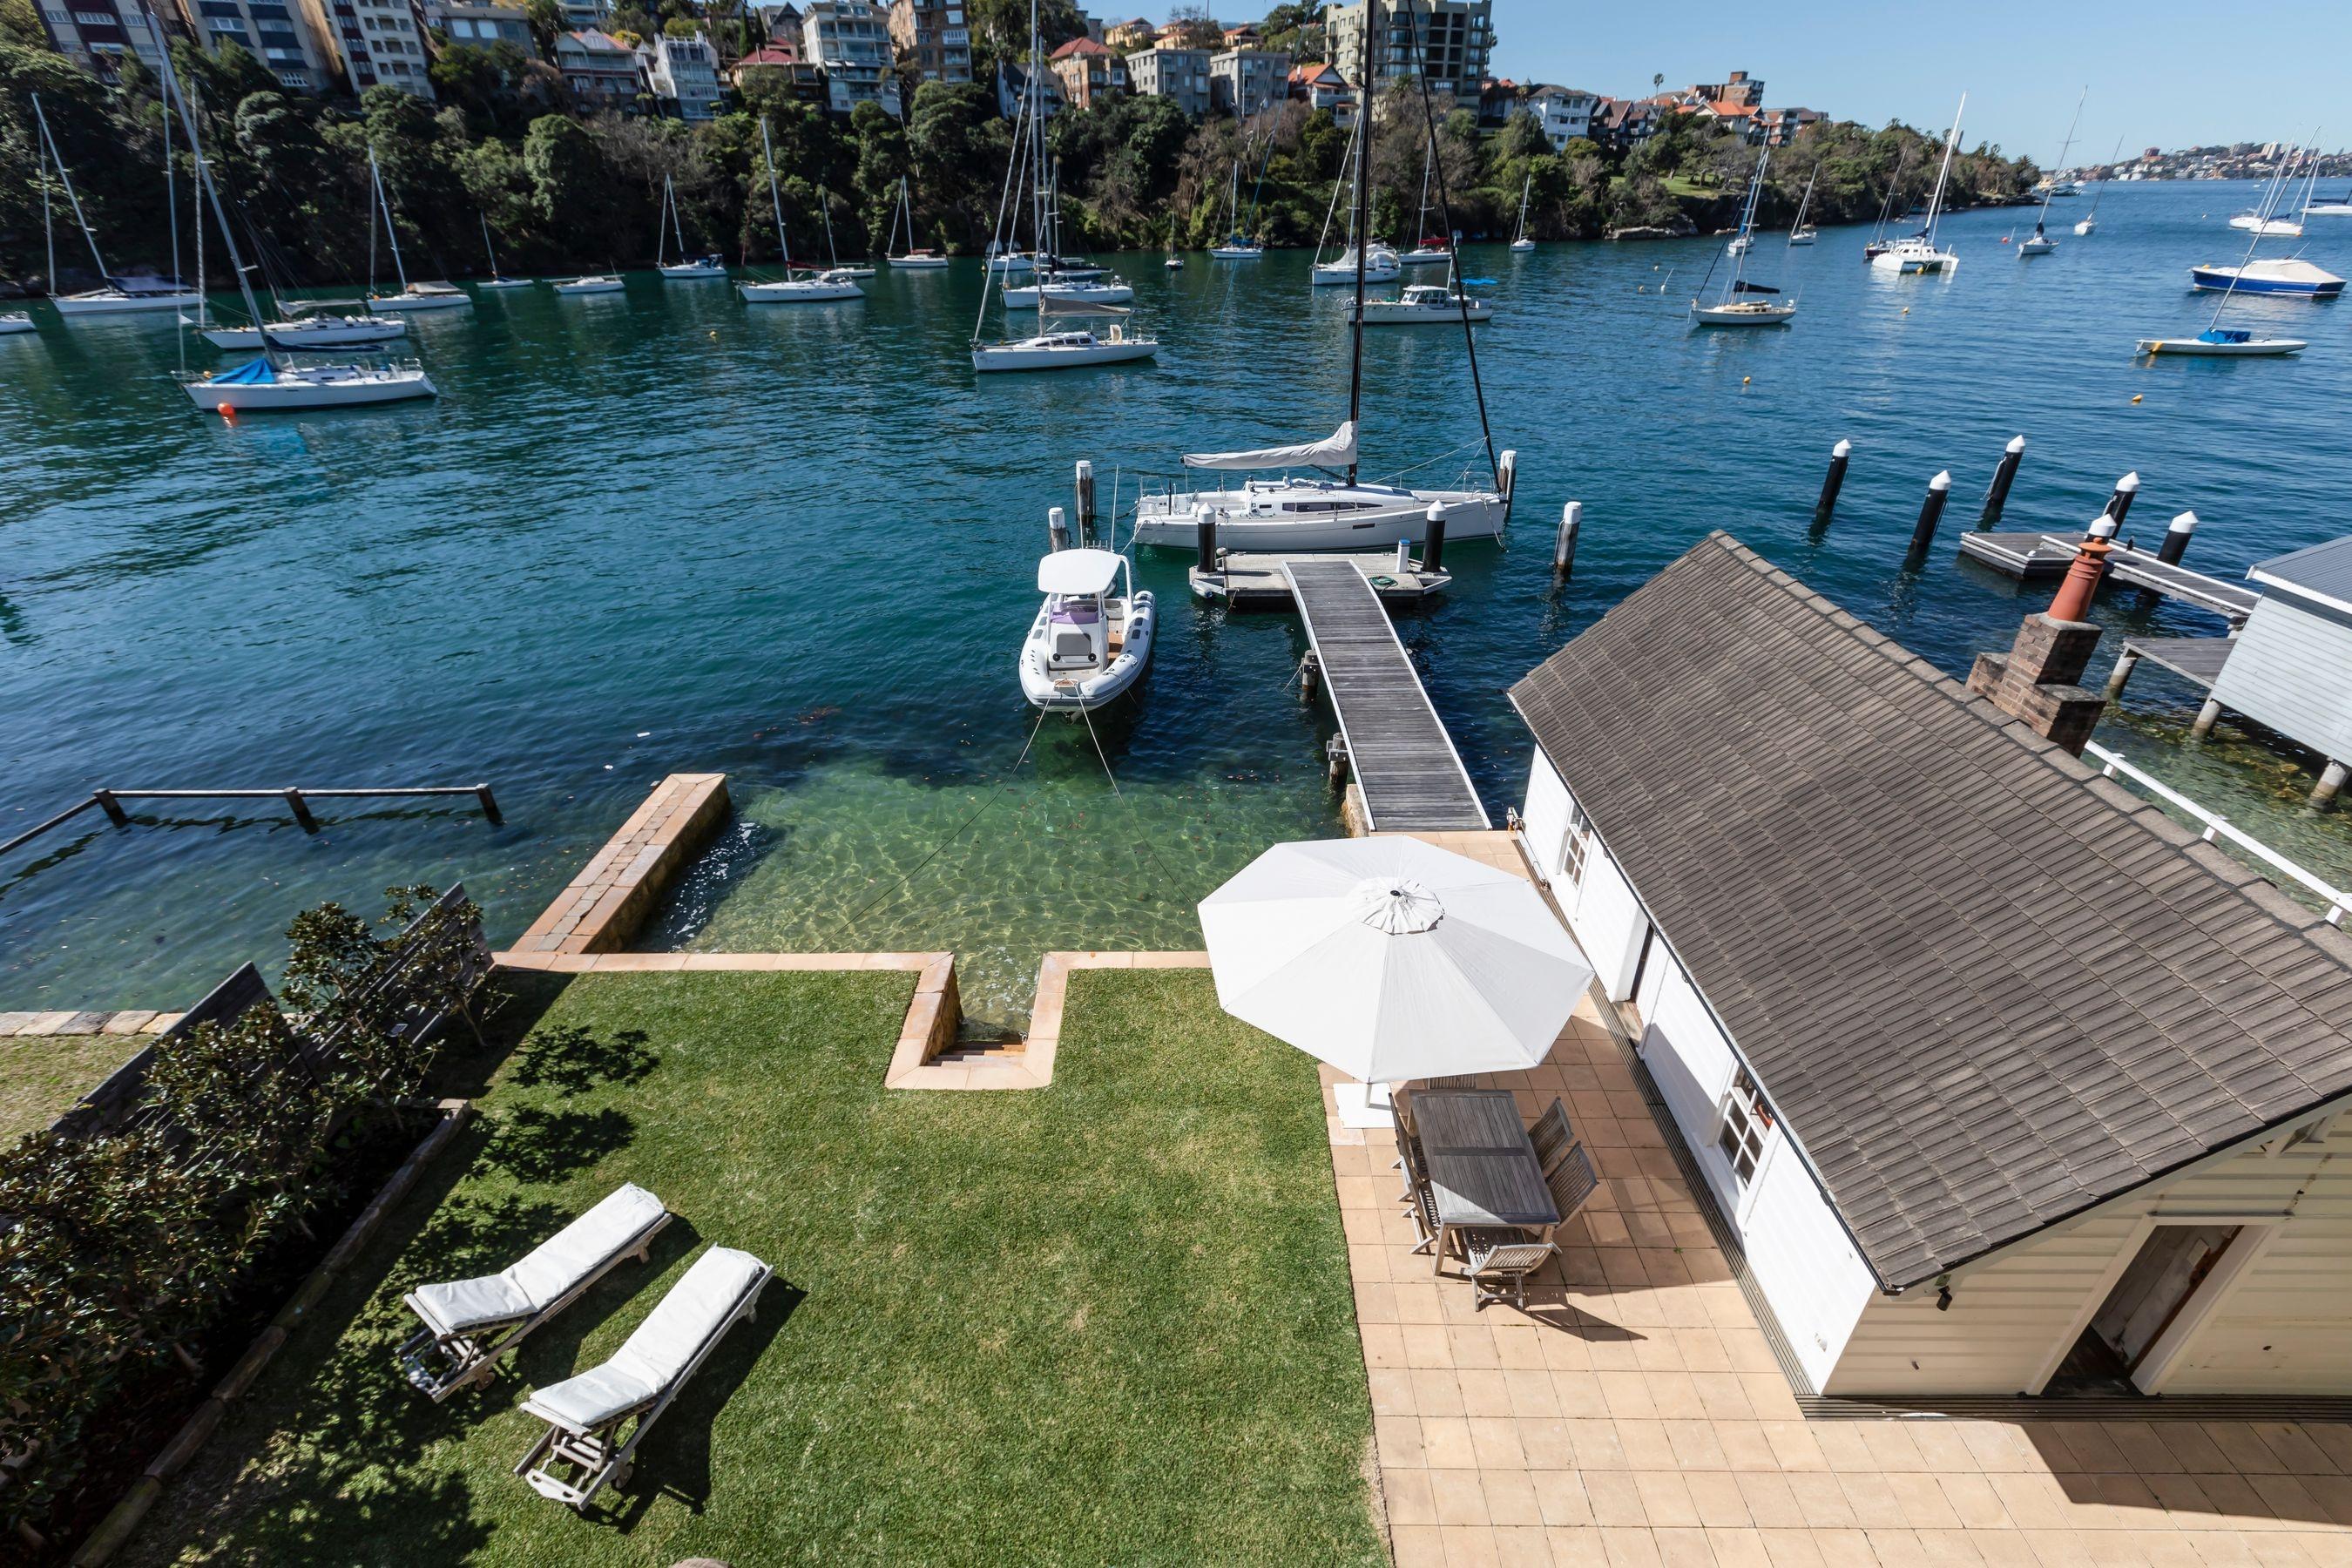 Oceania - Australia - New south wales area - Sydney area - The Boat House - Image 1/48